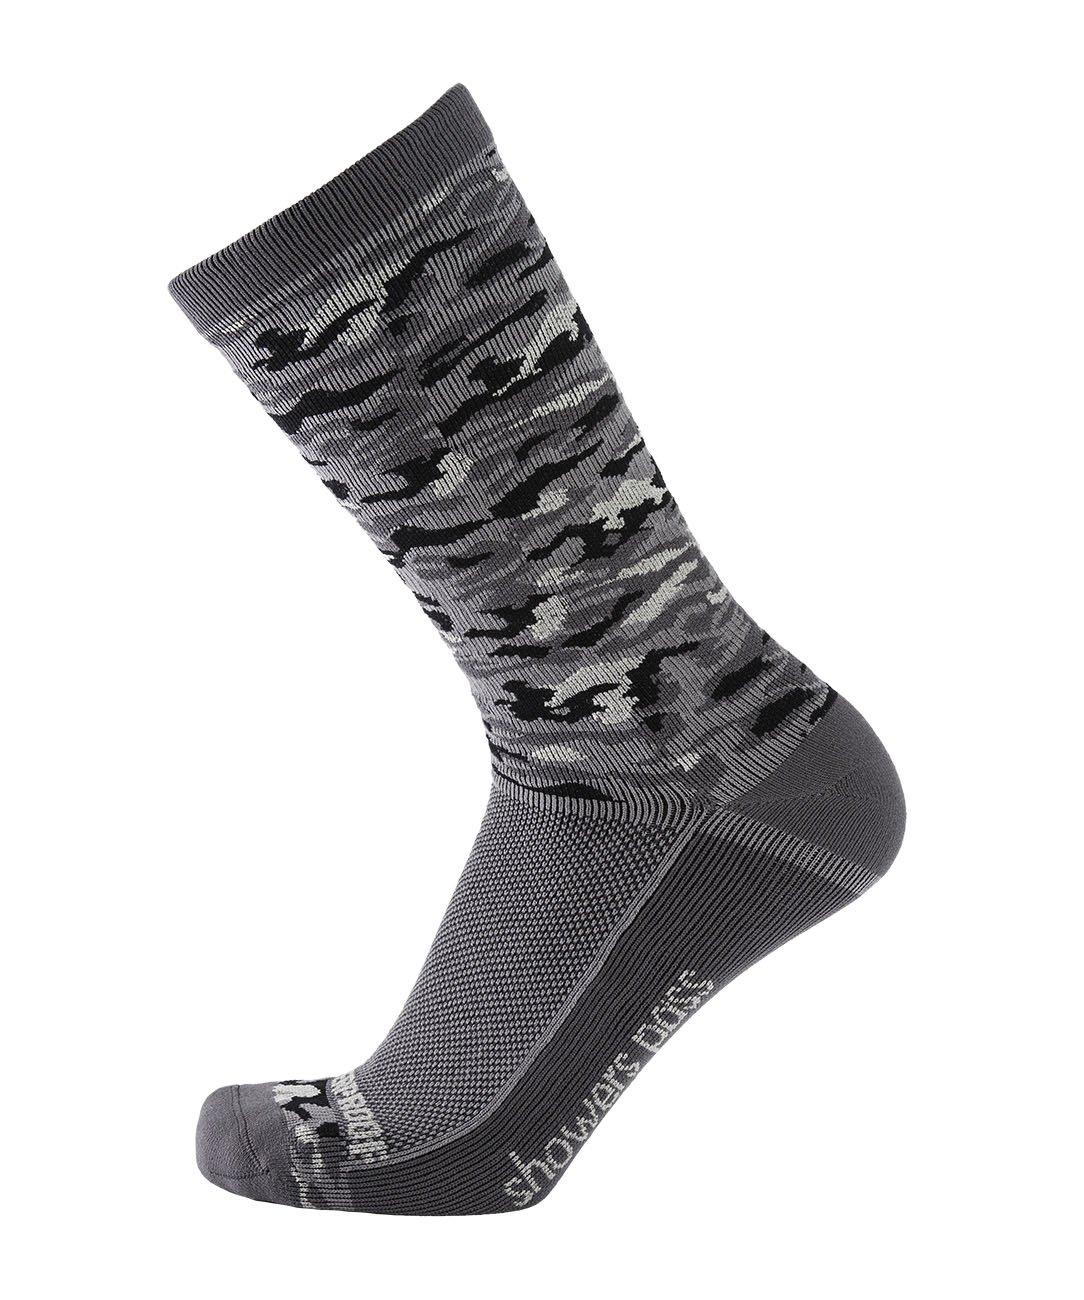 Showers Pass 100% Waterproof Lightweight Breathable Multisport Unisex Socks - Crosspoint Camo